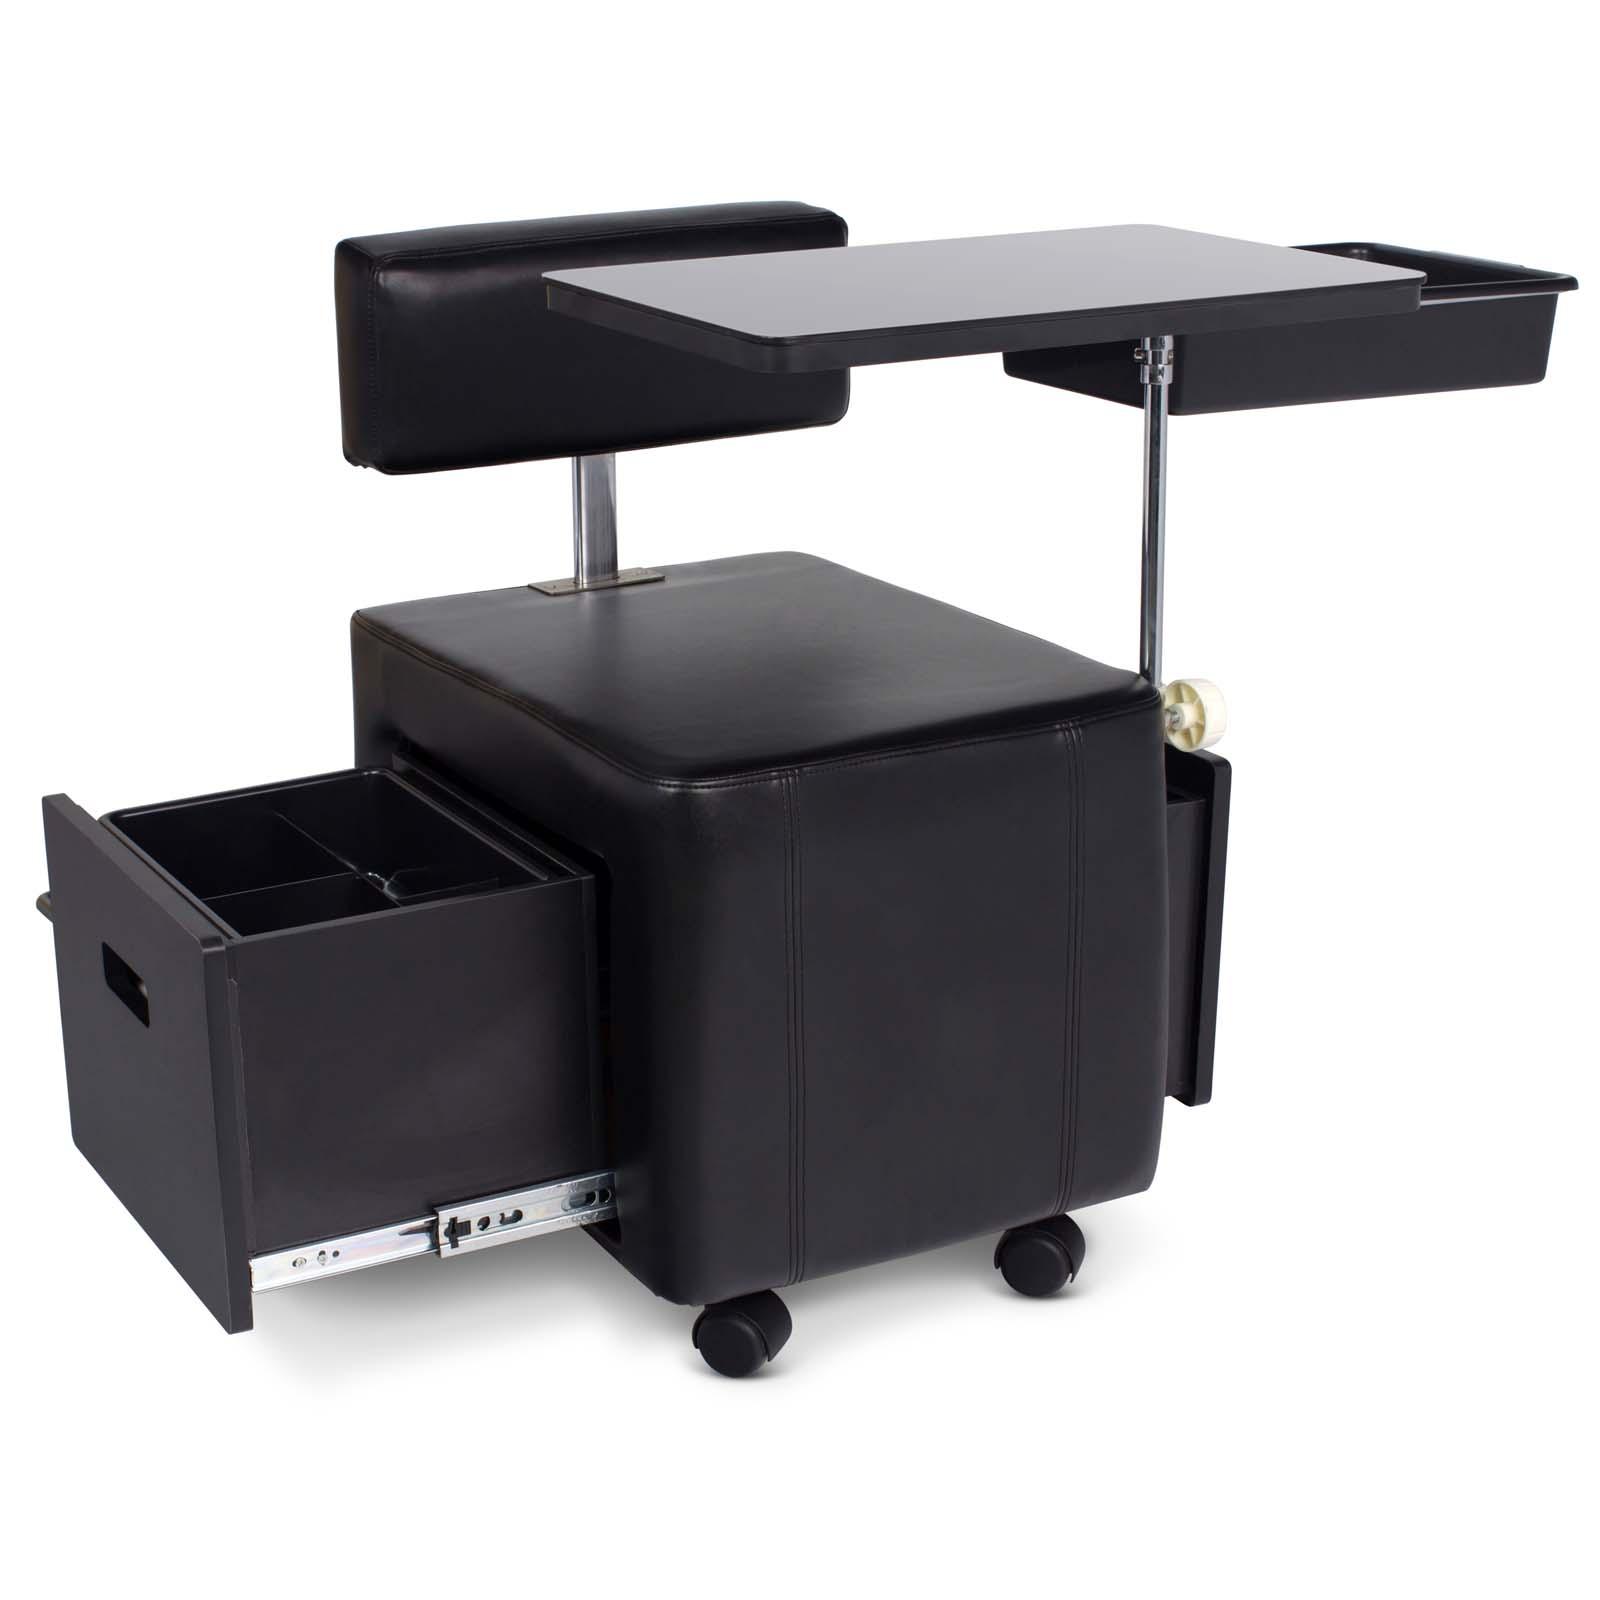 tazo portable space saver manicure nail table ebay. Black Bedroom Furniture Sets. Home Design Ideas